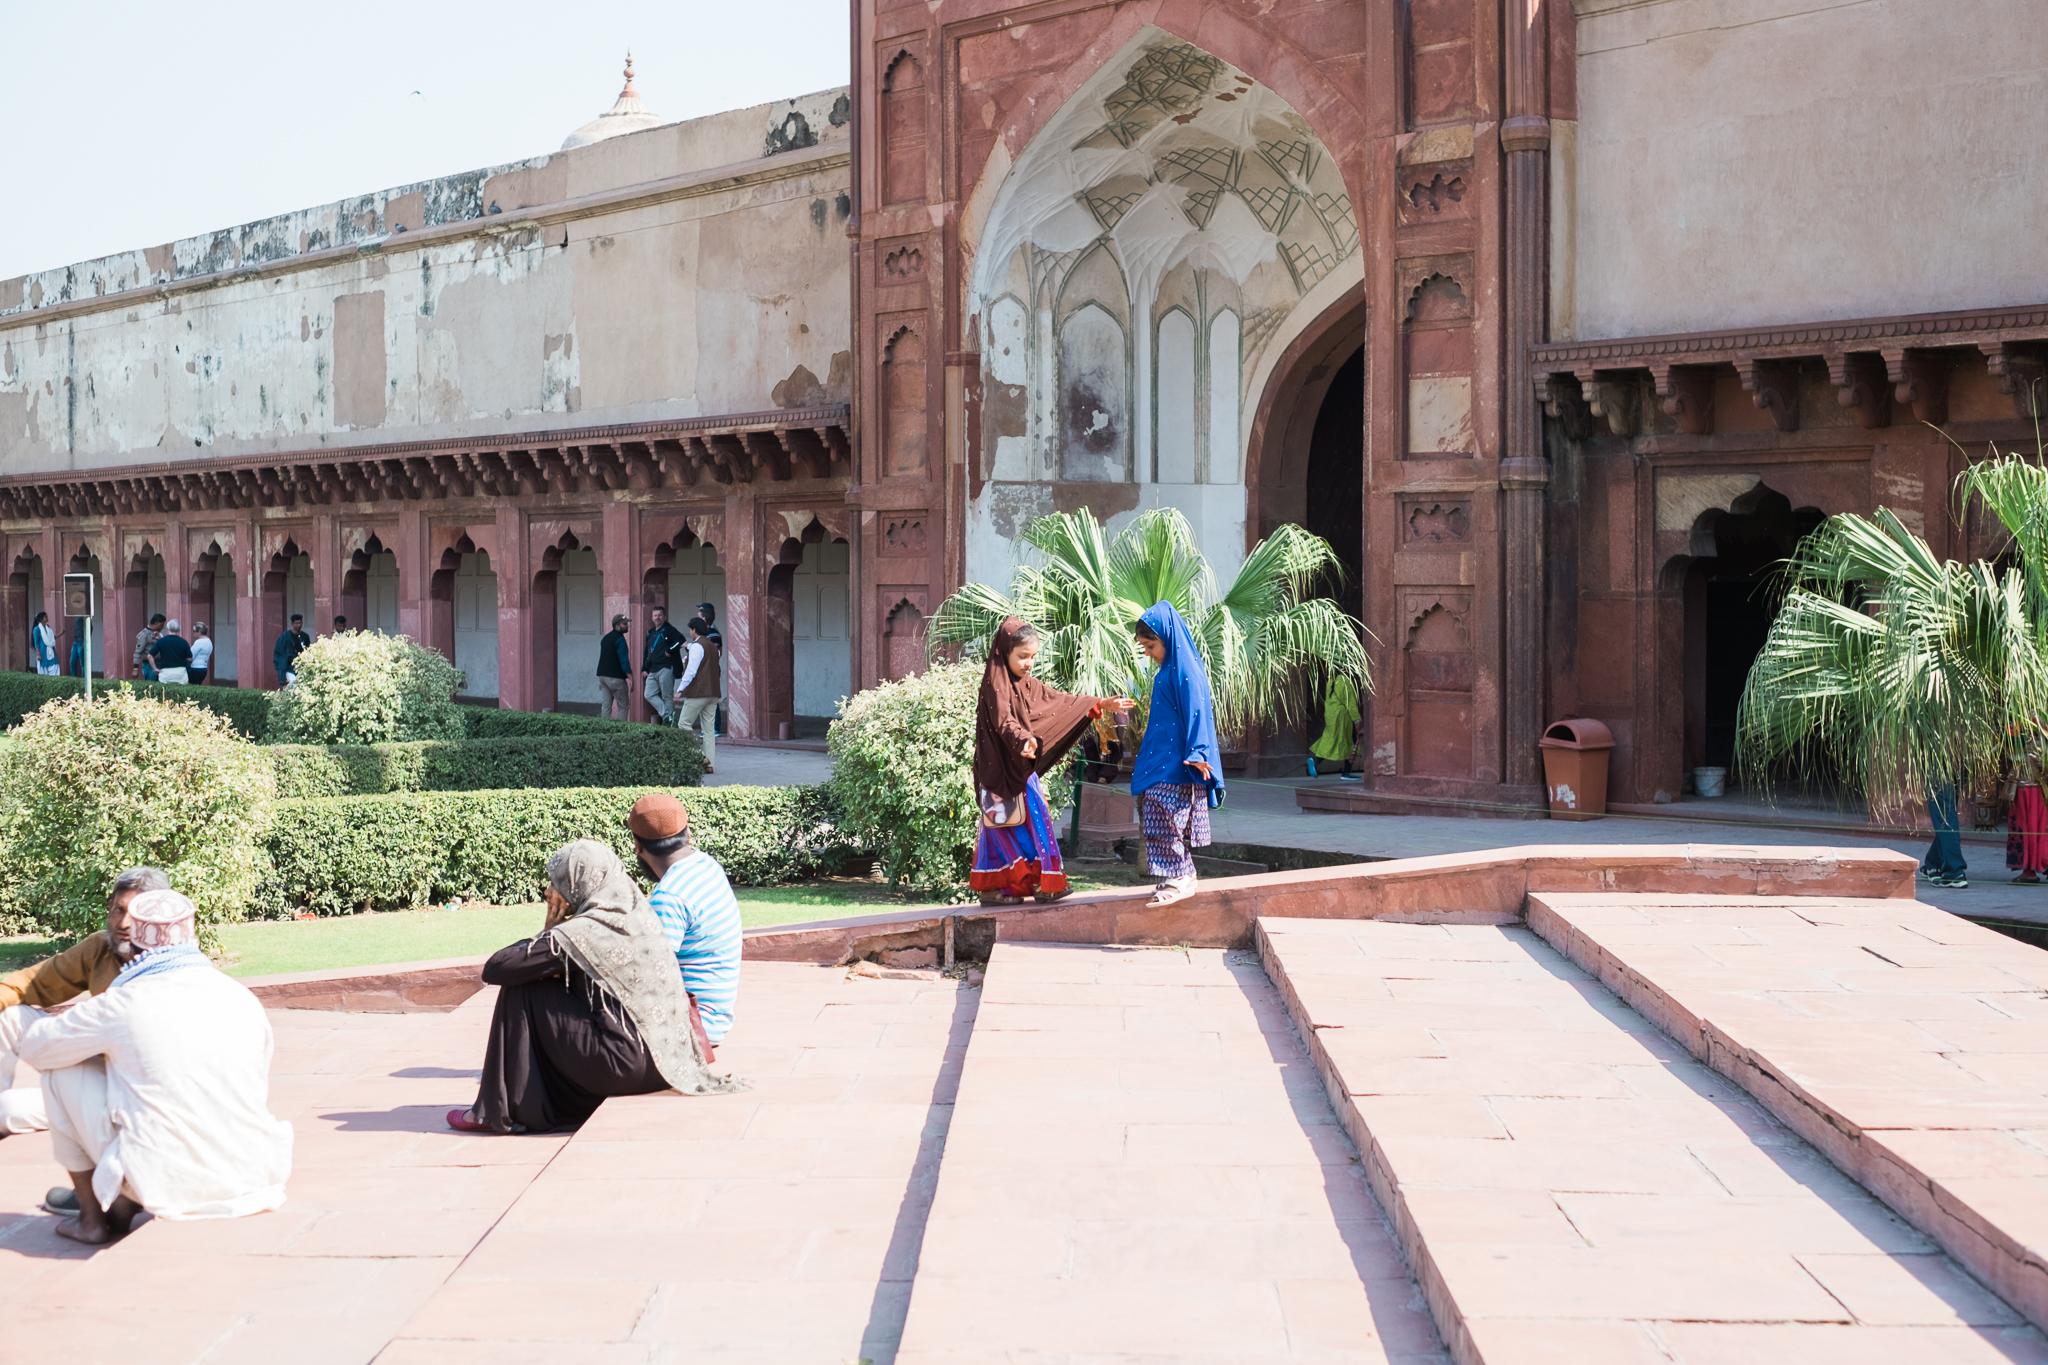 Agra India Travel Street Photography (31 of 39).jpg